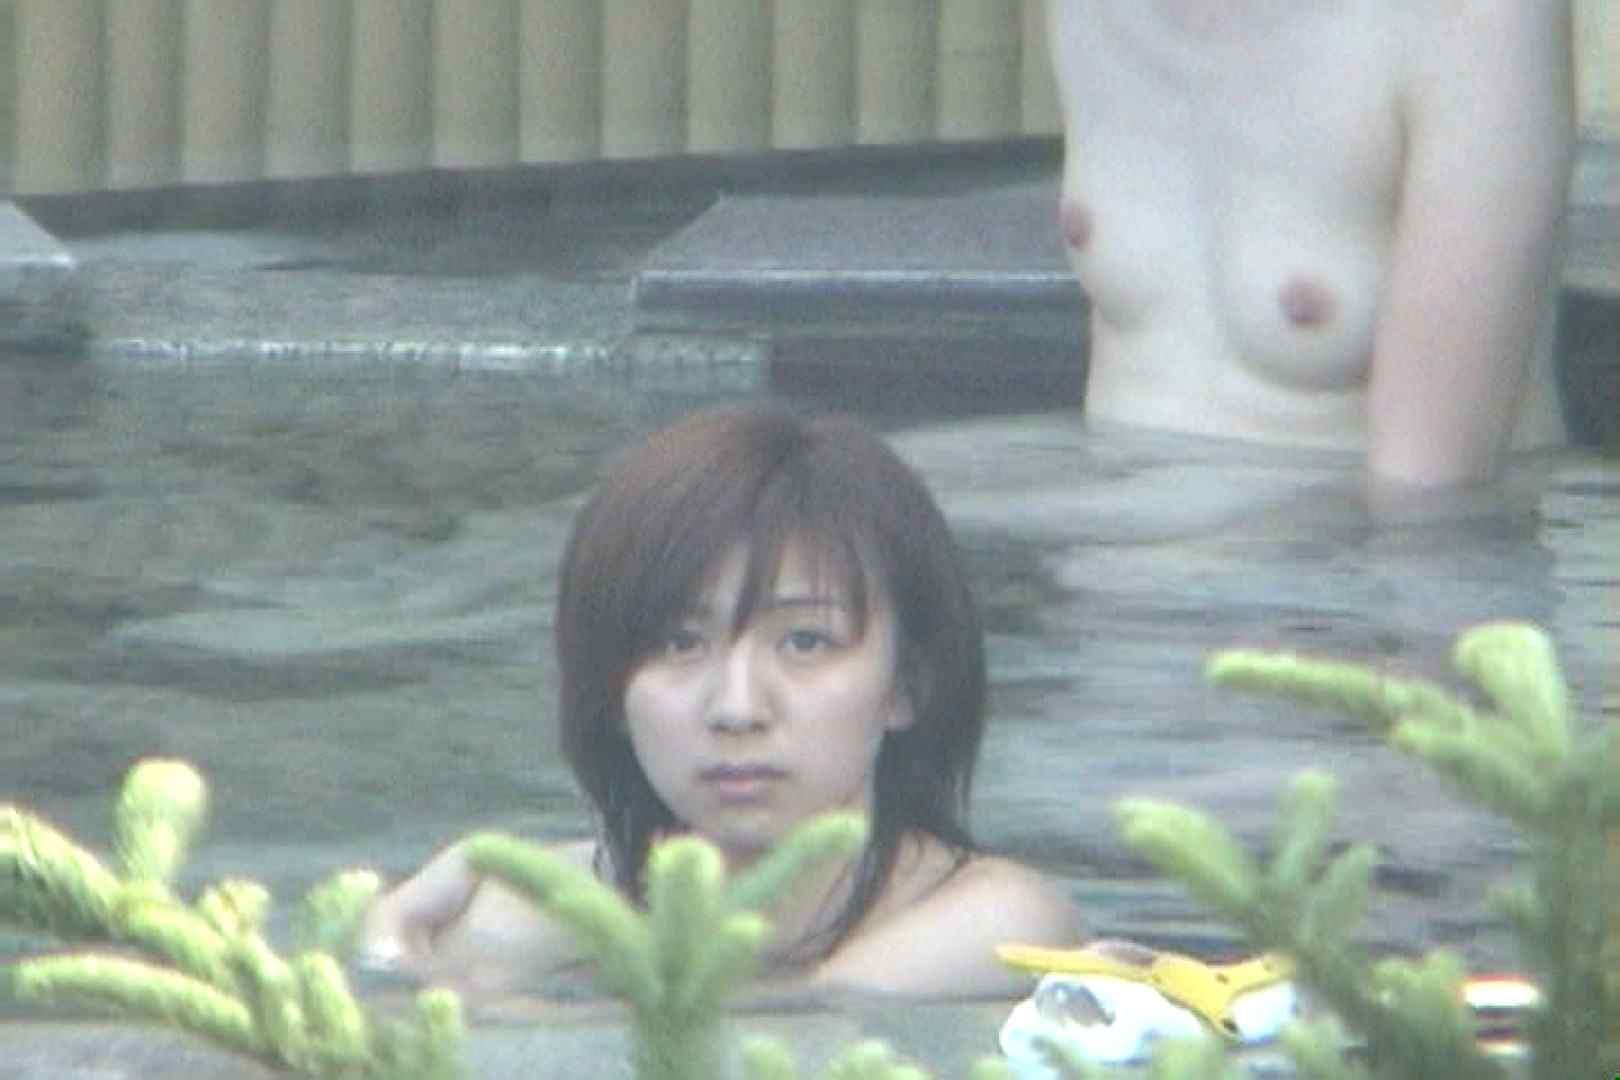 Aquaな露天風呂Vol.77【VIP限定】 露天   盗撮特集  98画像 65